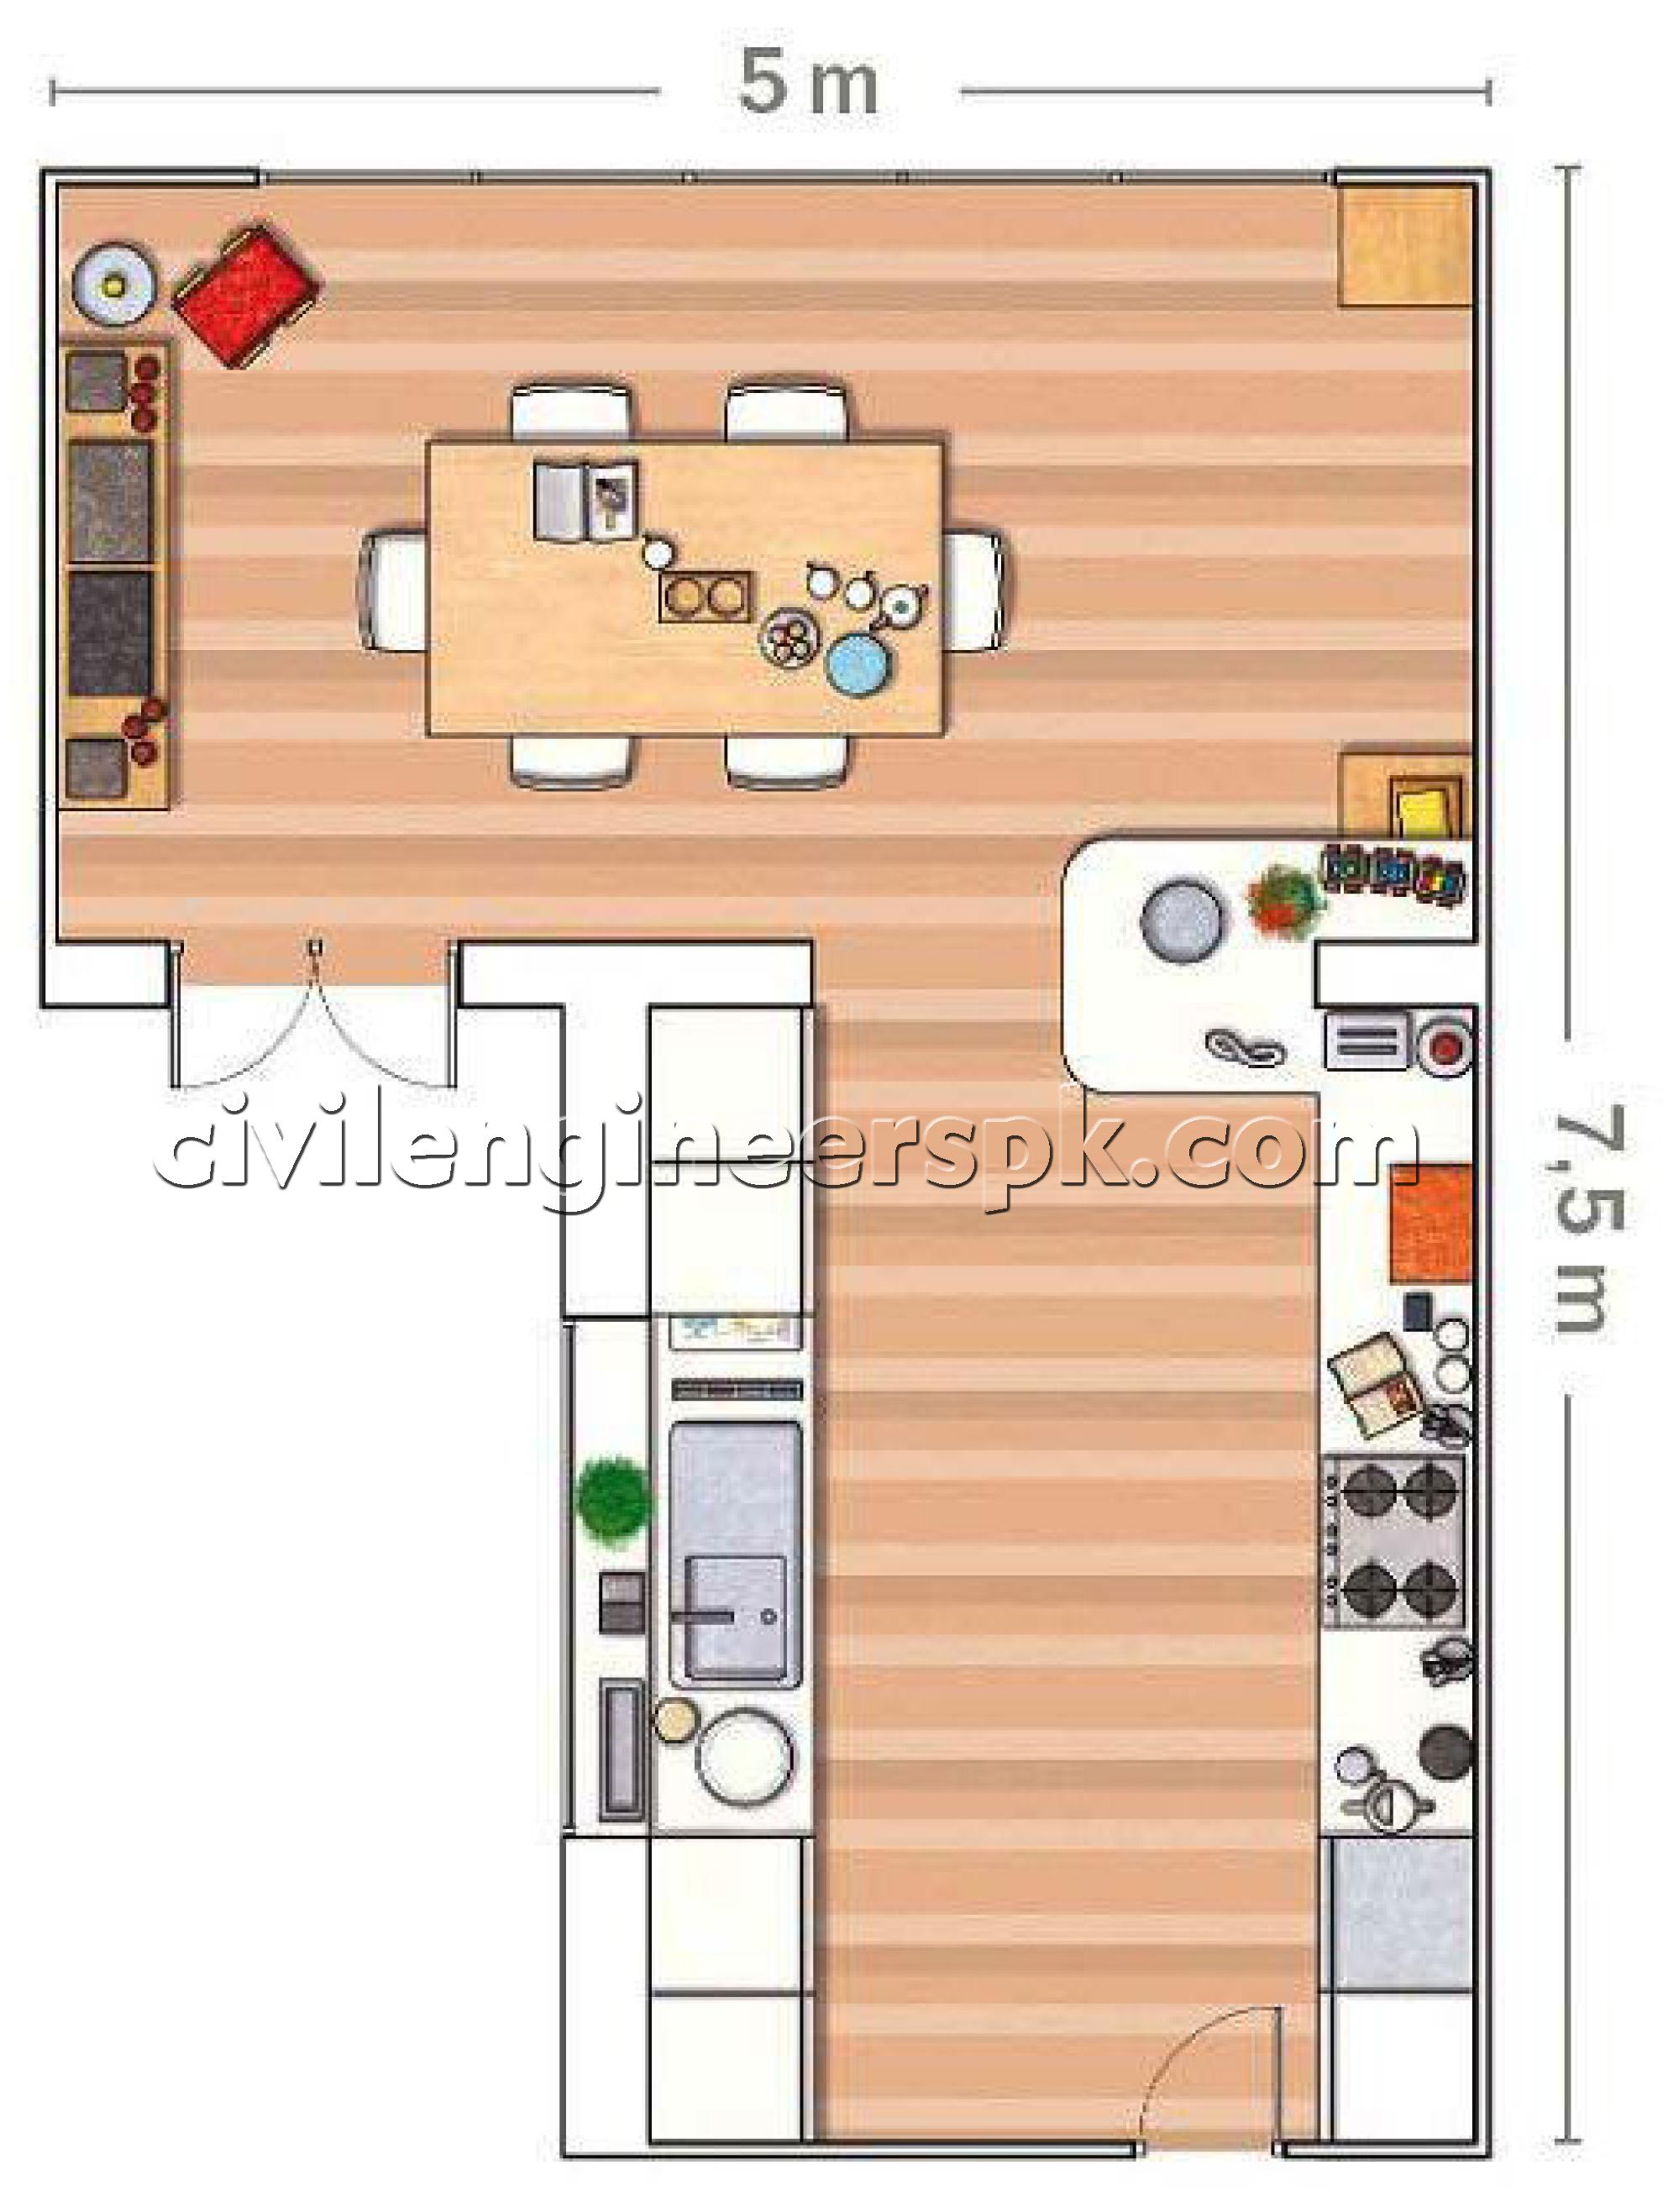 Kitchen house plan hottest home design for Civil kitchen designs